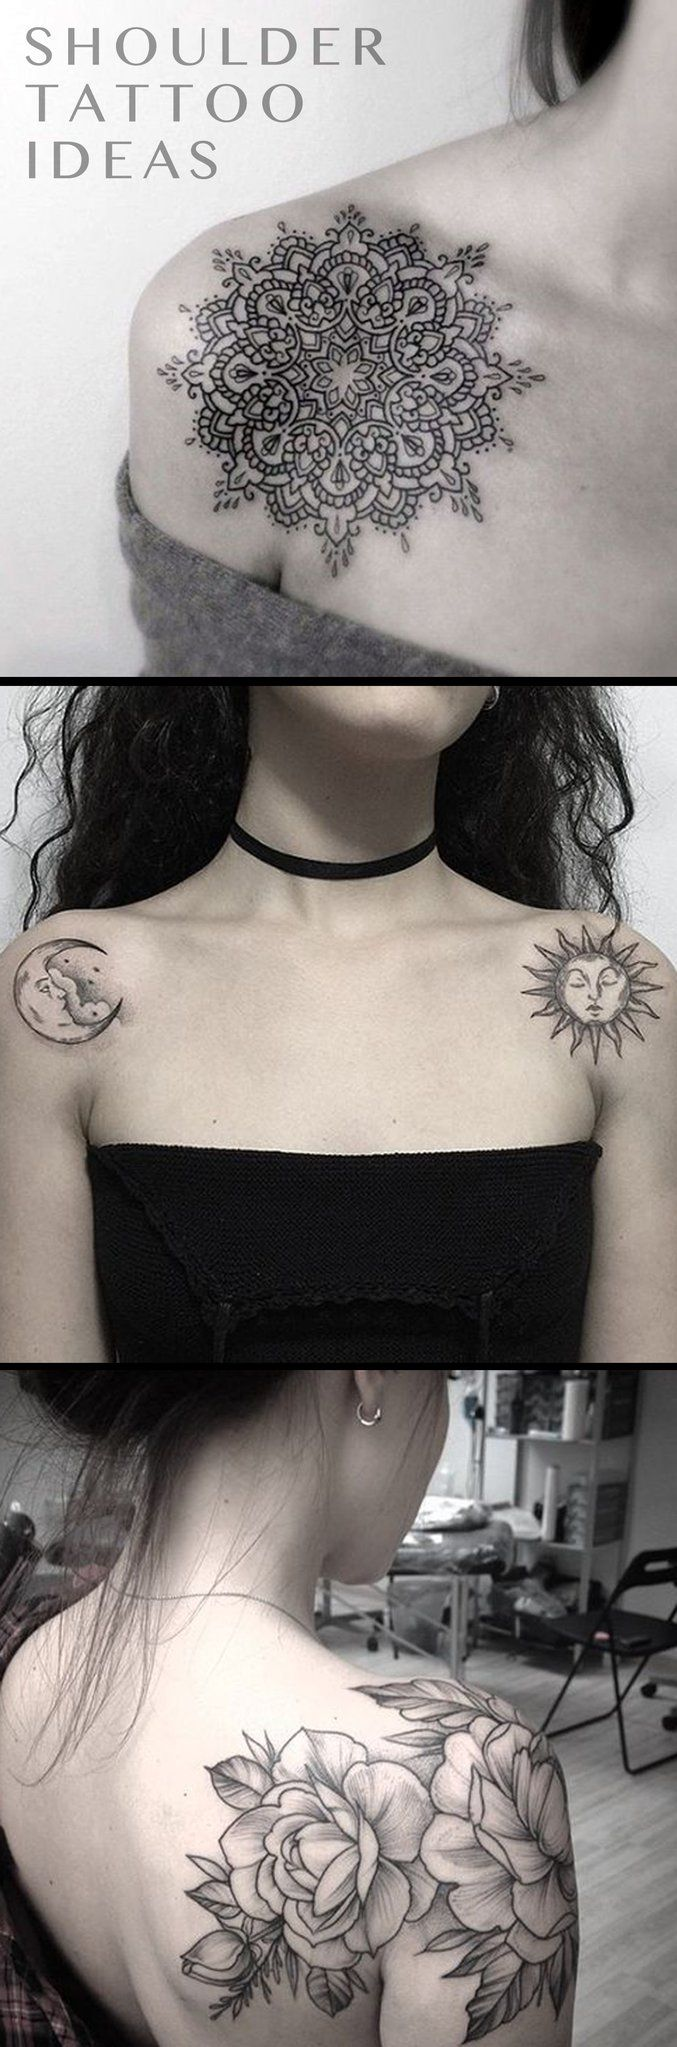 Best 25 tattoos ideas on pinterest ink tattoo ideas and rose tattoos - Tatouage rose signification ...